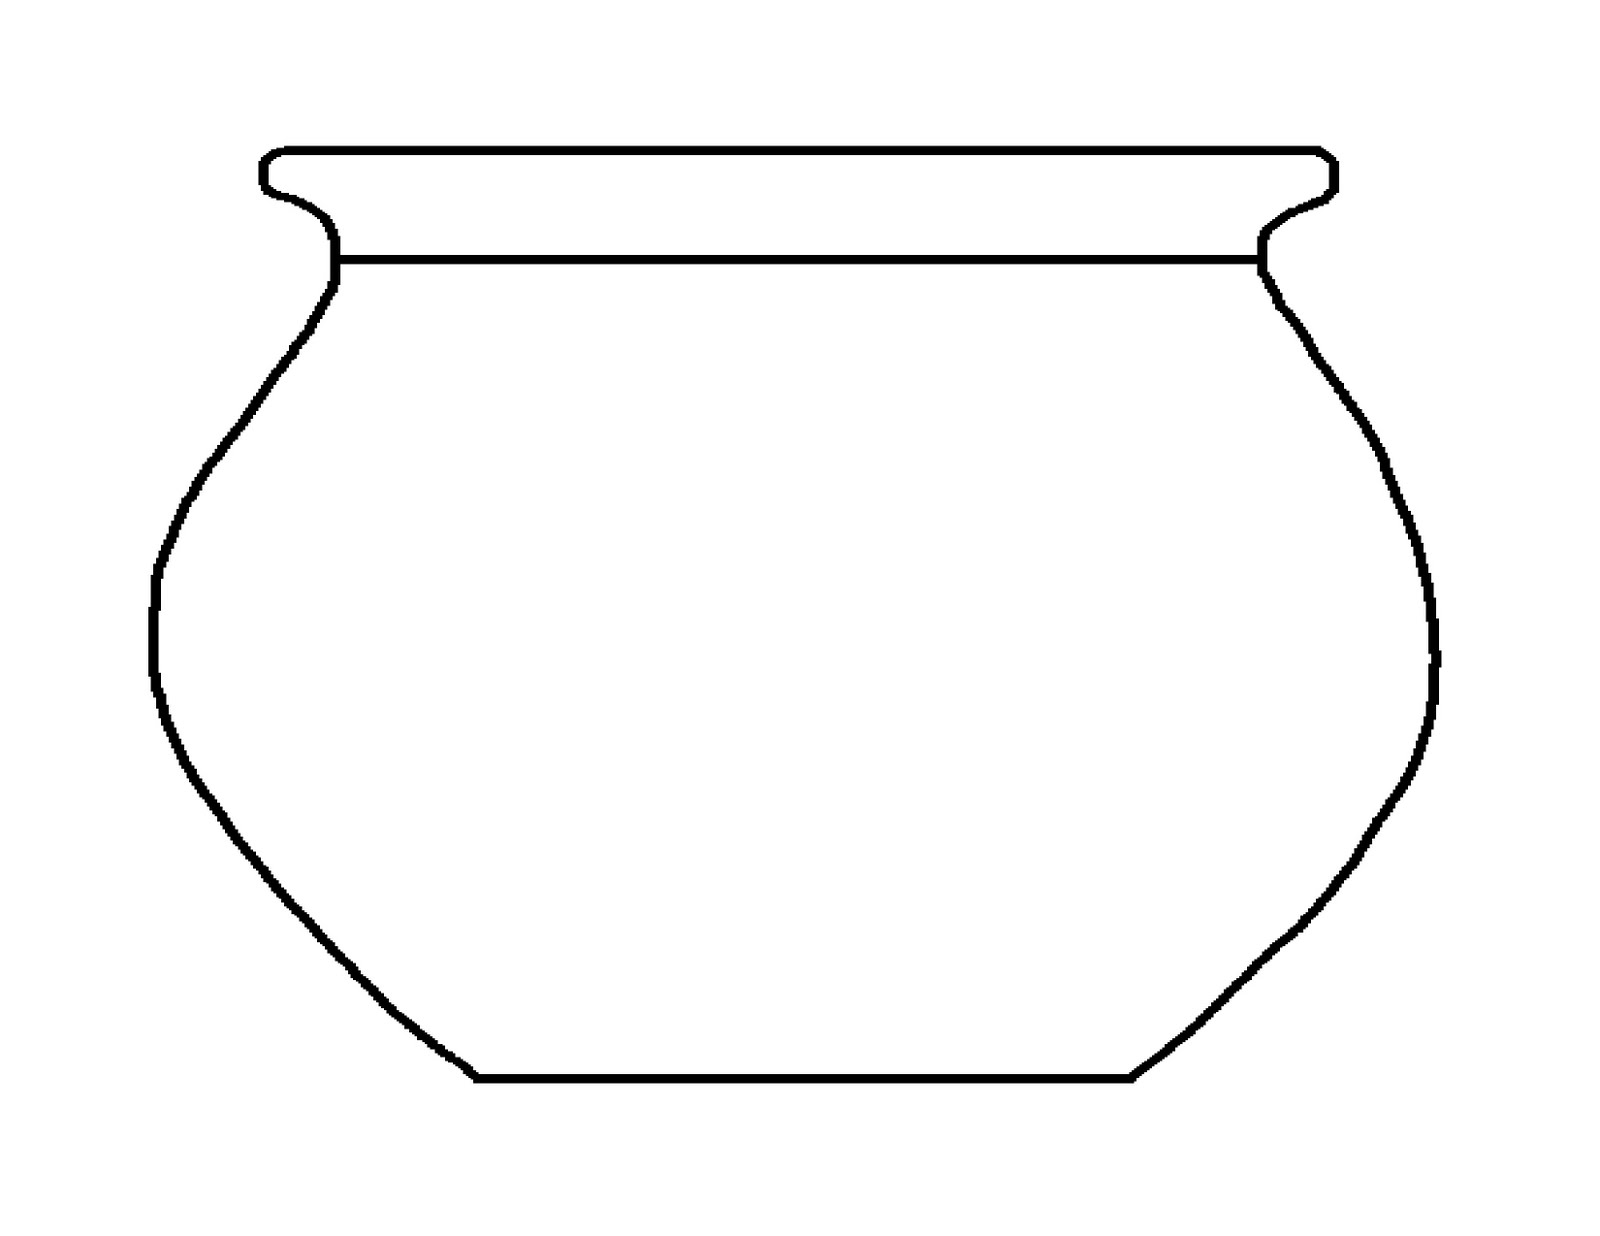 Fish Bowl clipart #20, Download drawings